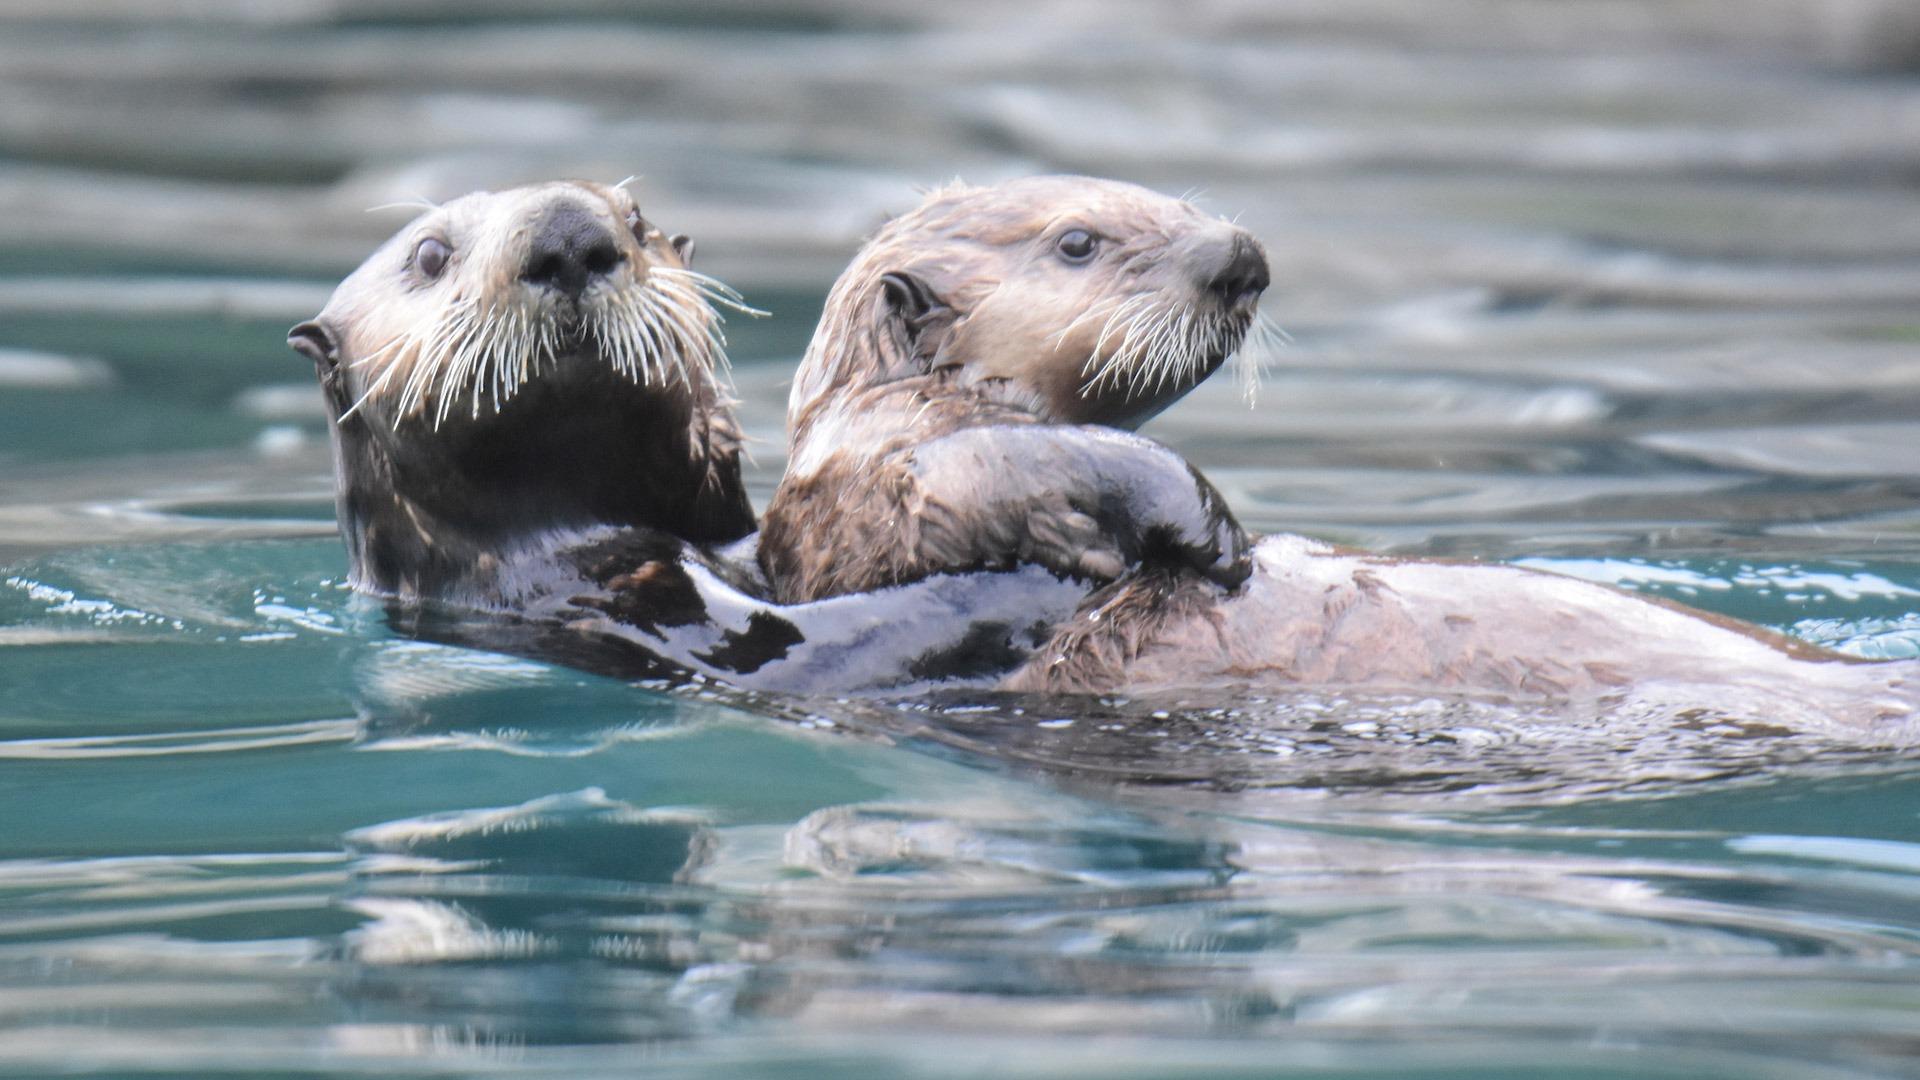 Playful sea otters in Alaska